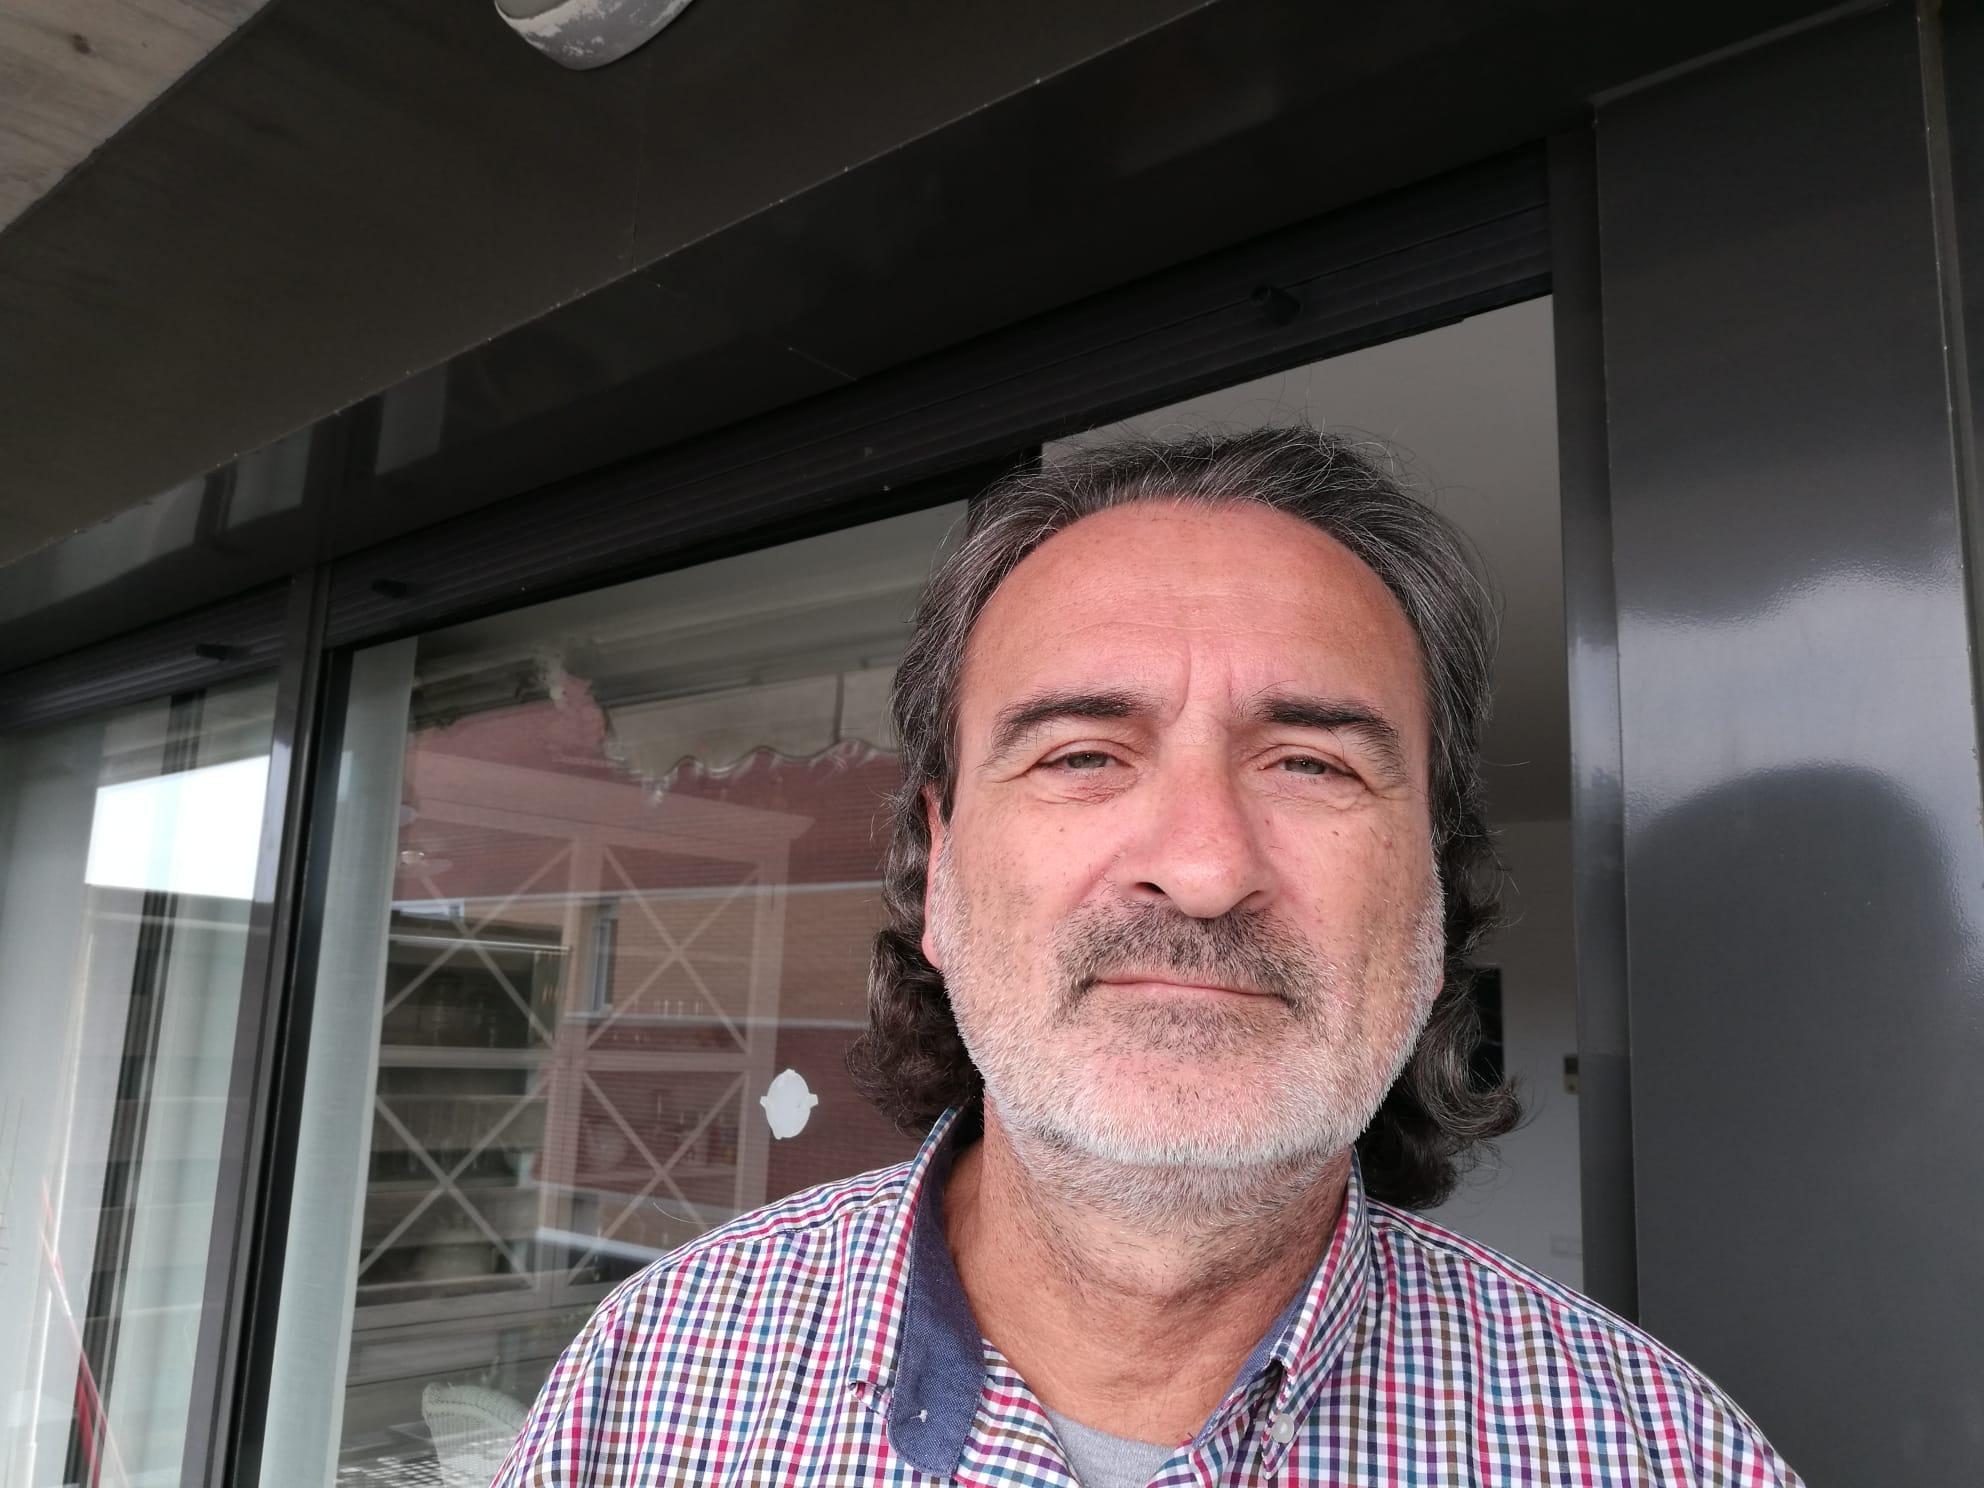 IMG-20210509-WA00Revista Literaria Galeradas. Miguel Verdaguer Turró01